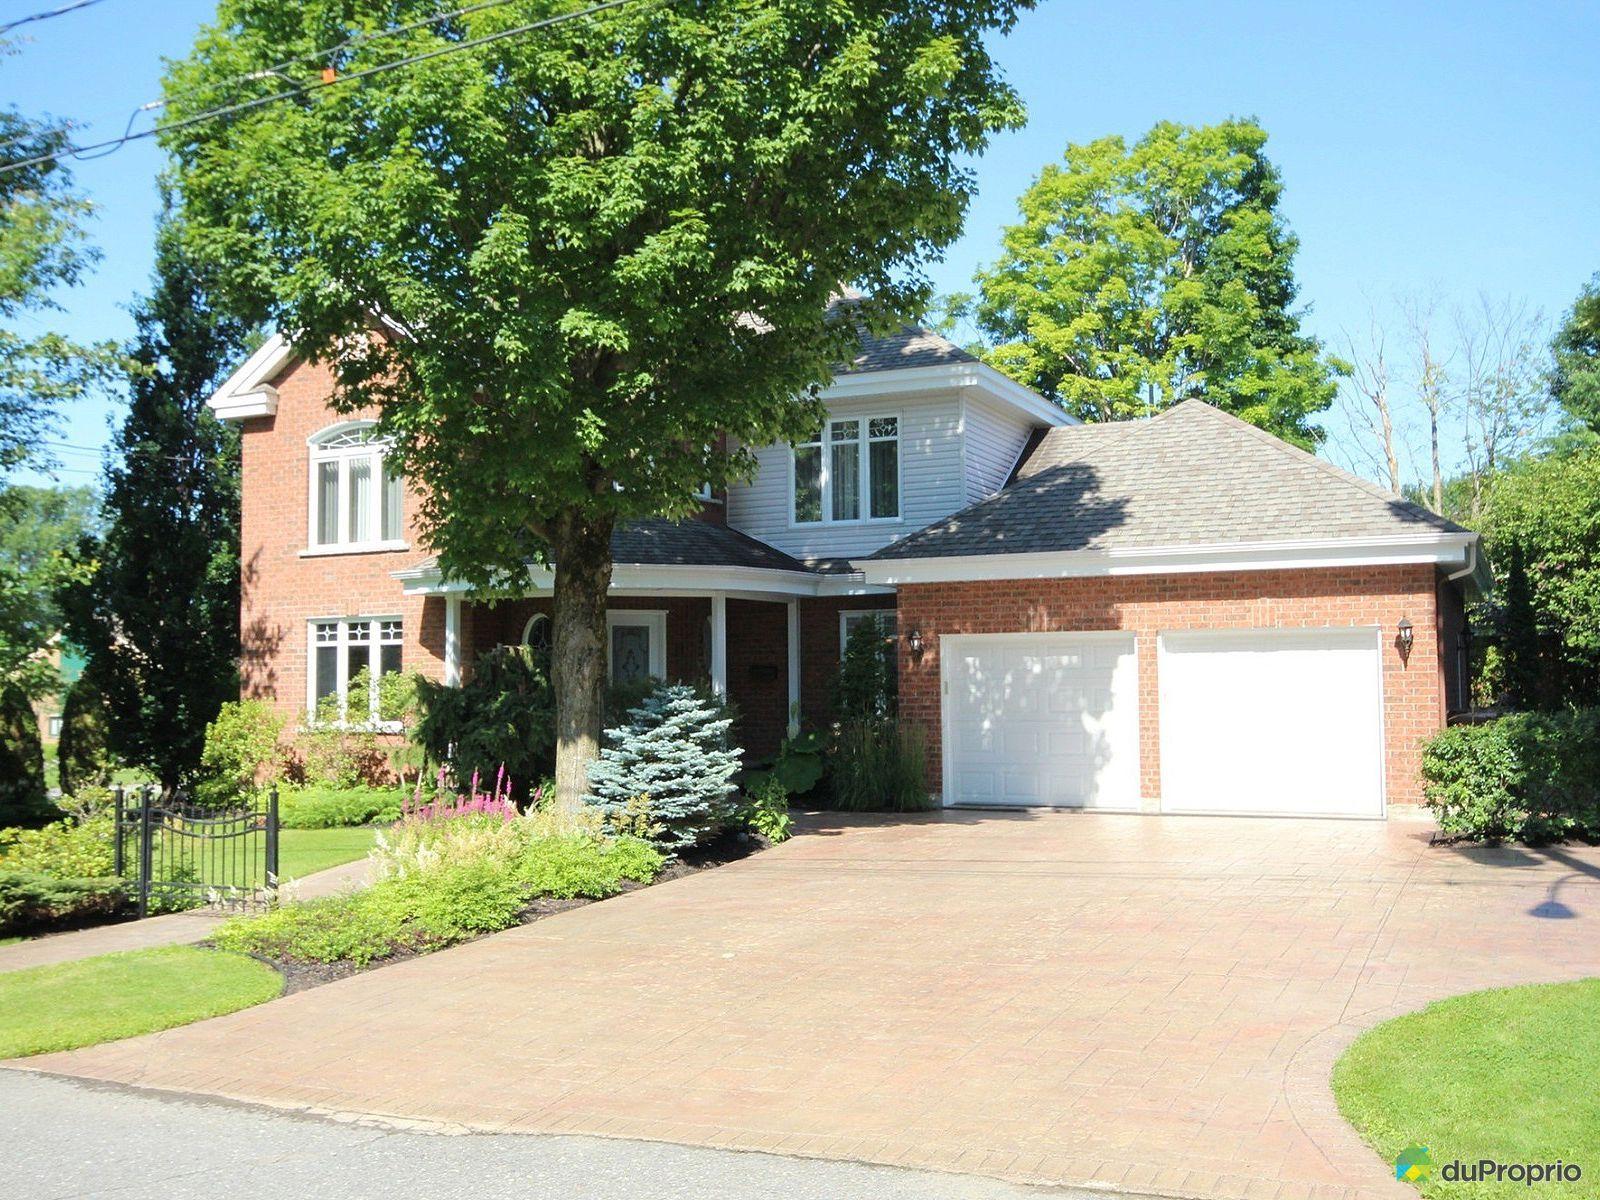 84 rue leclerc victoriaville vendre duproprio - Application maison a vendre ...